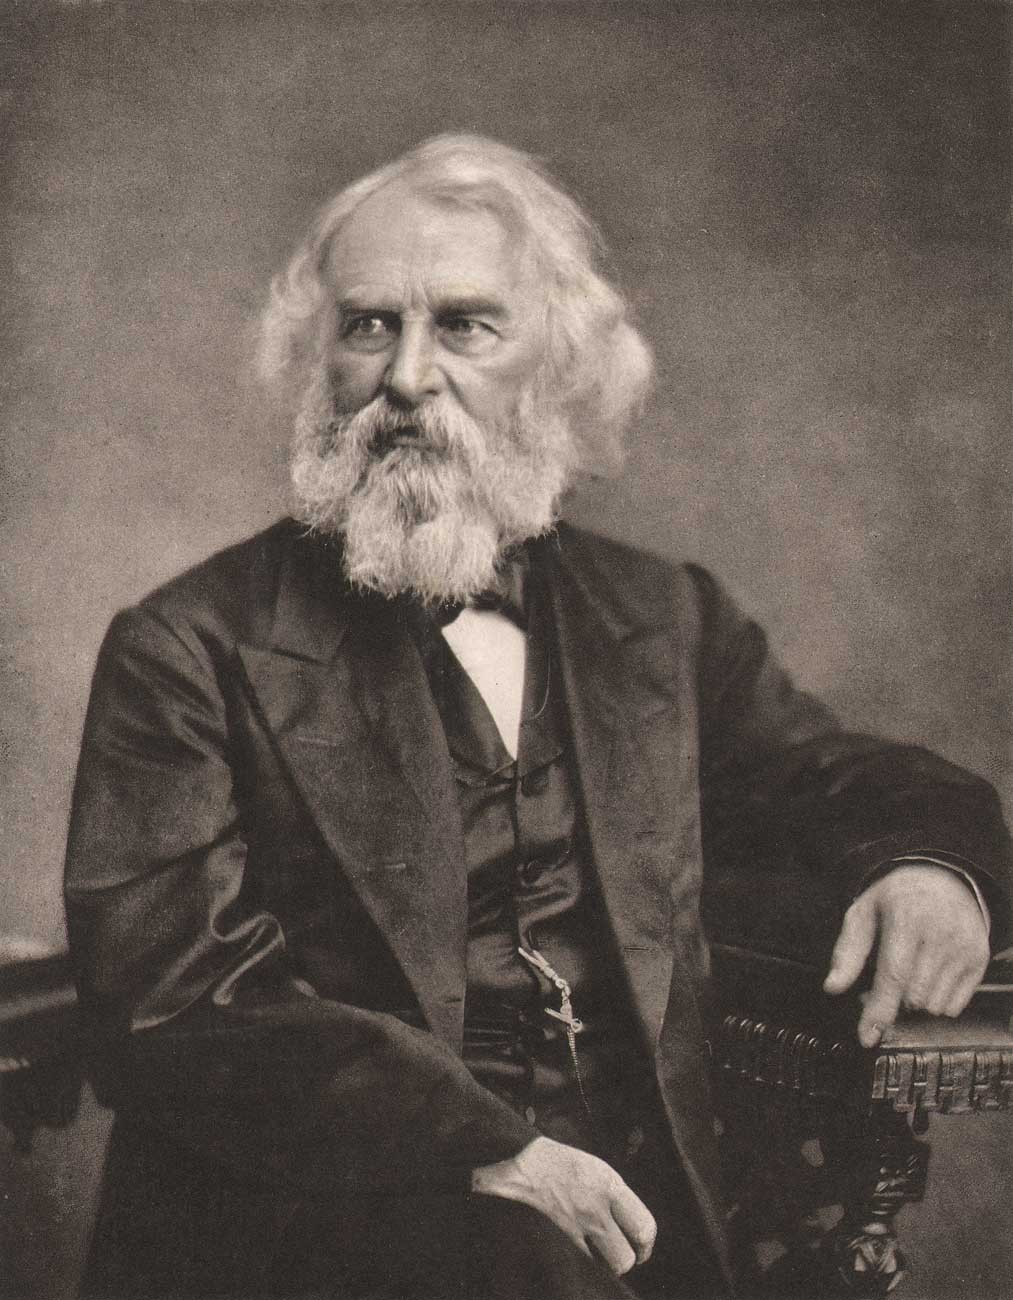 Henry Wadsworth Longfellow photo #6035, Henry Wadsworth Longfellow image